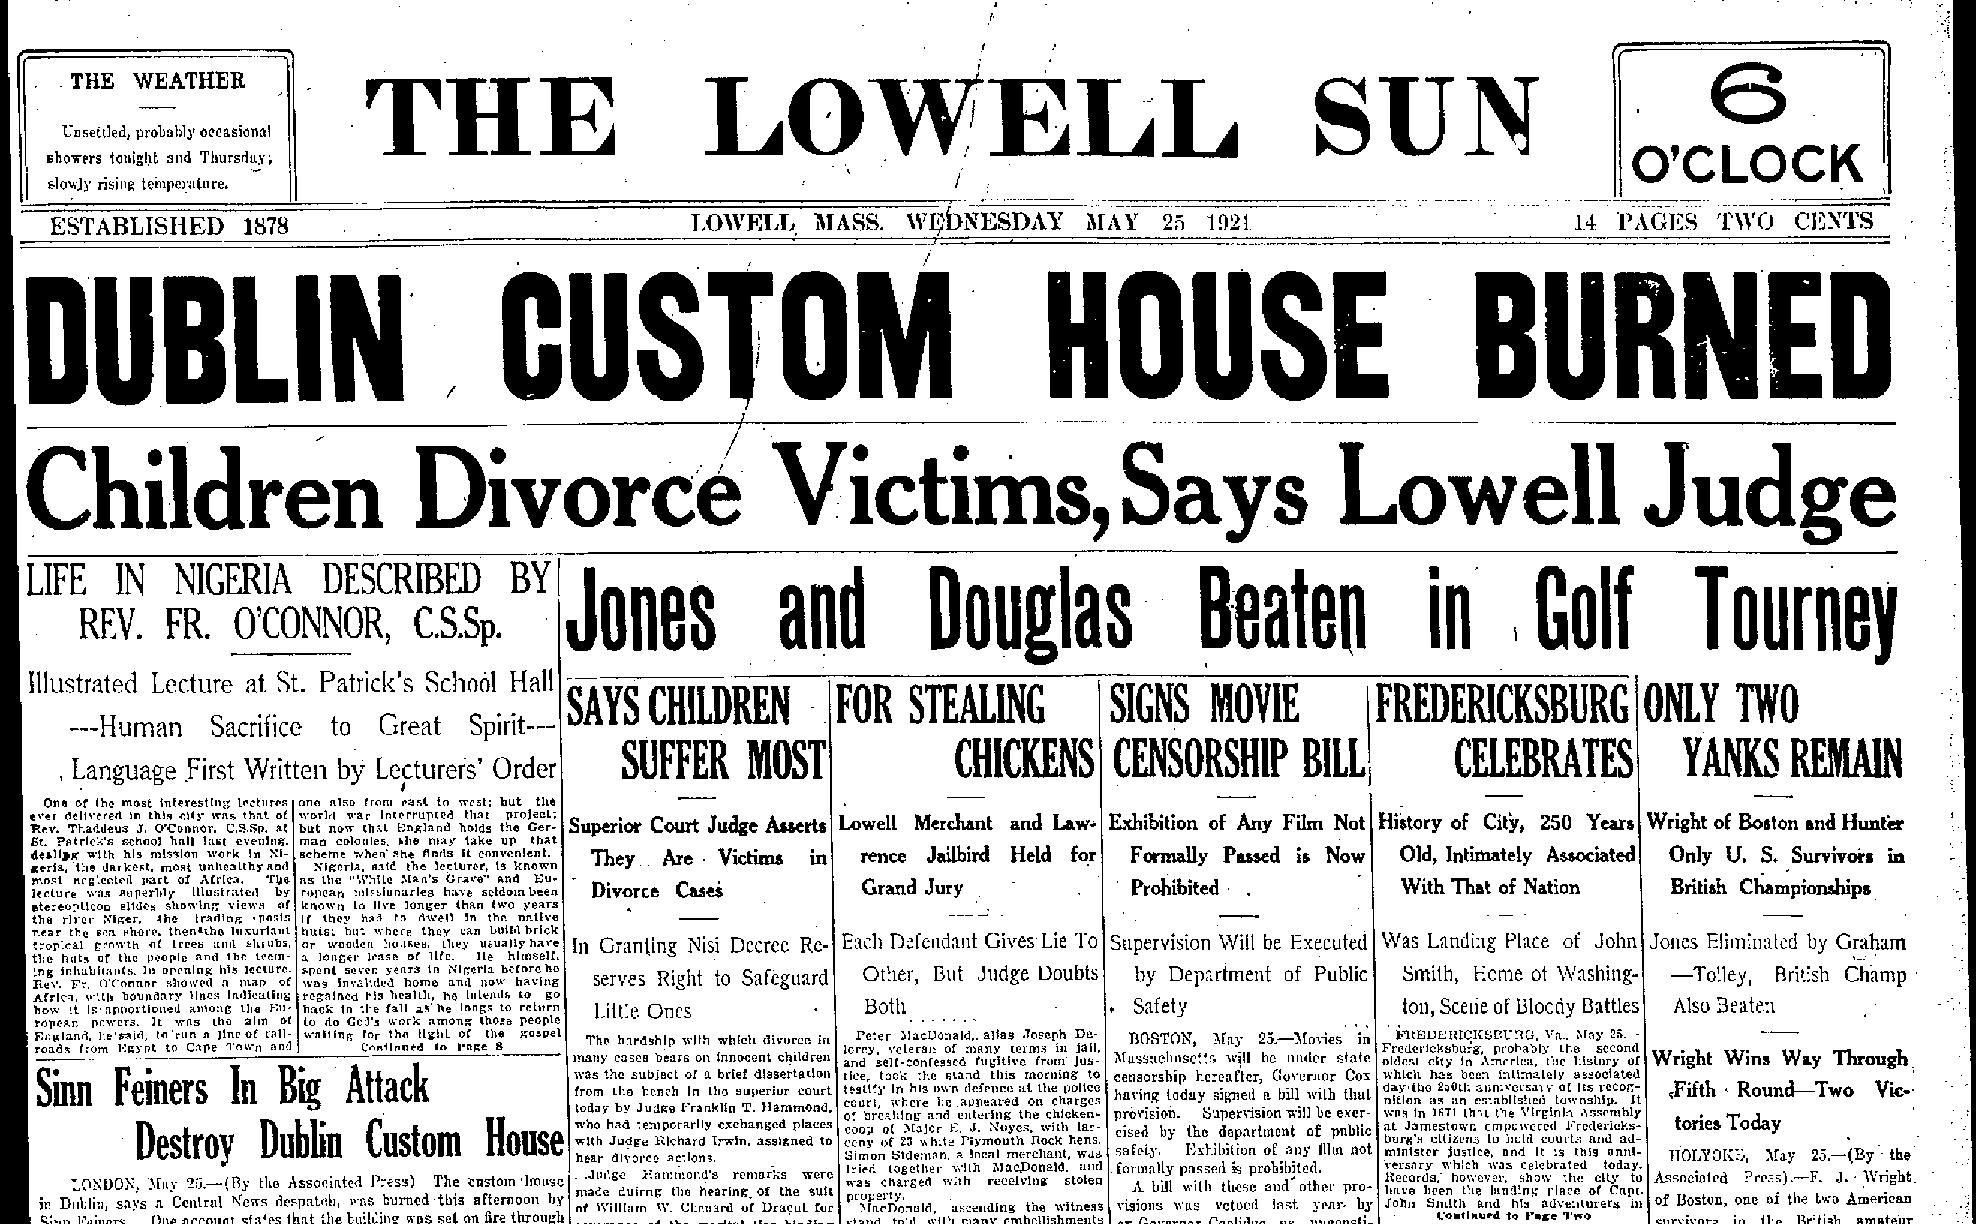 lowell-sun-may-25-1921-page-001 Burning of Dublin Custom House 1921